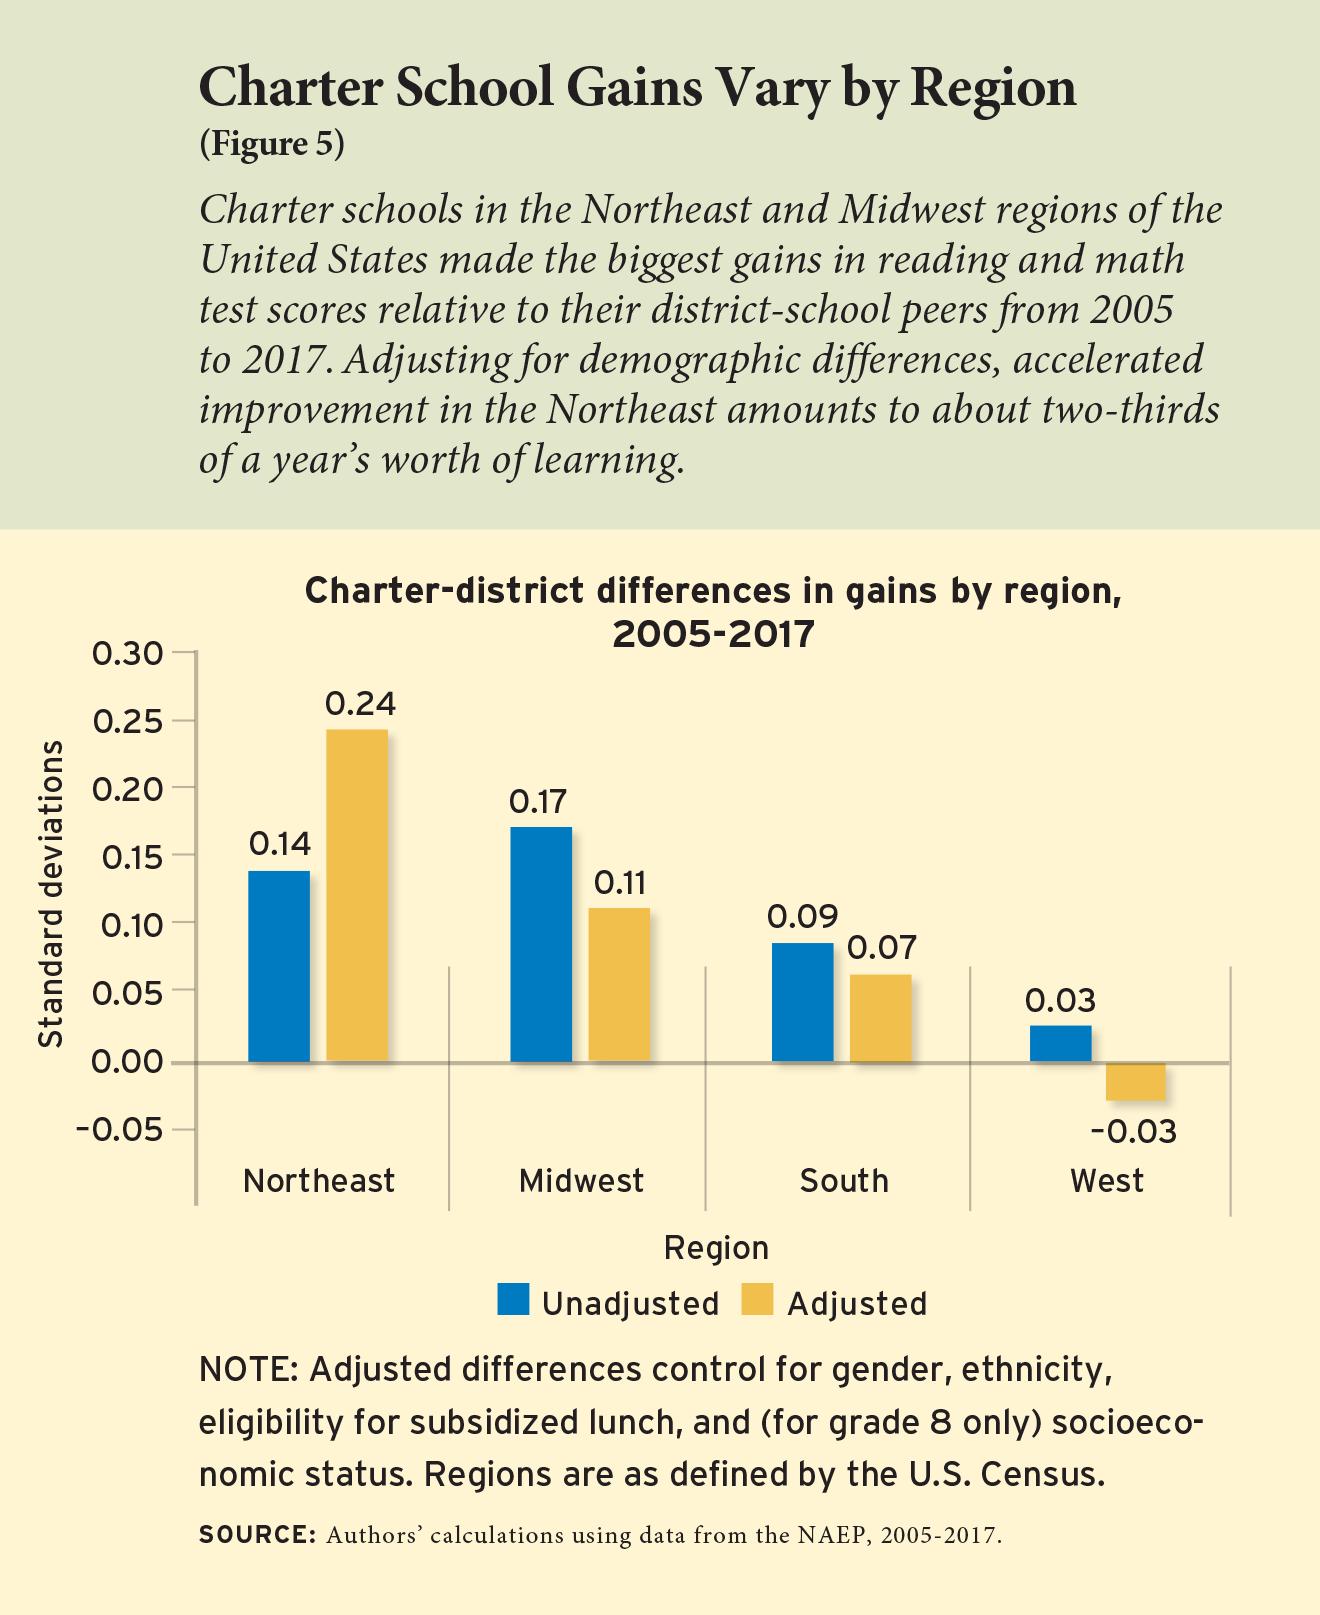 Figure 5 - Charter School Gains Vary by Region